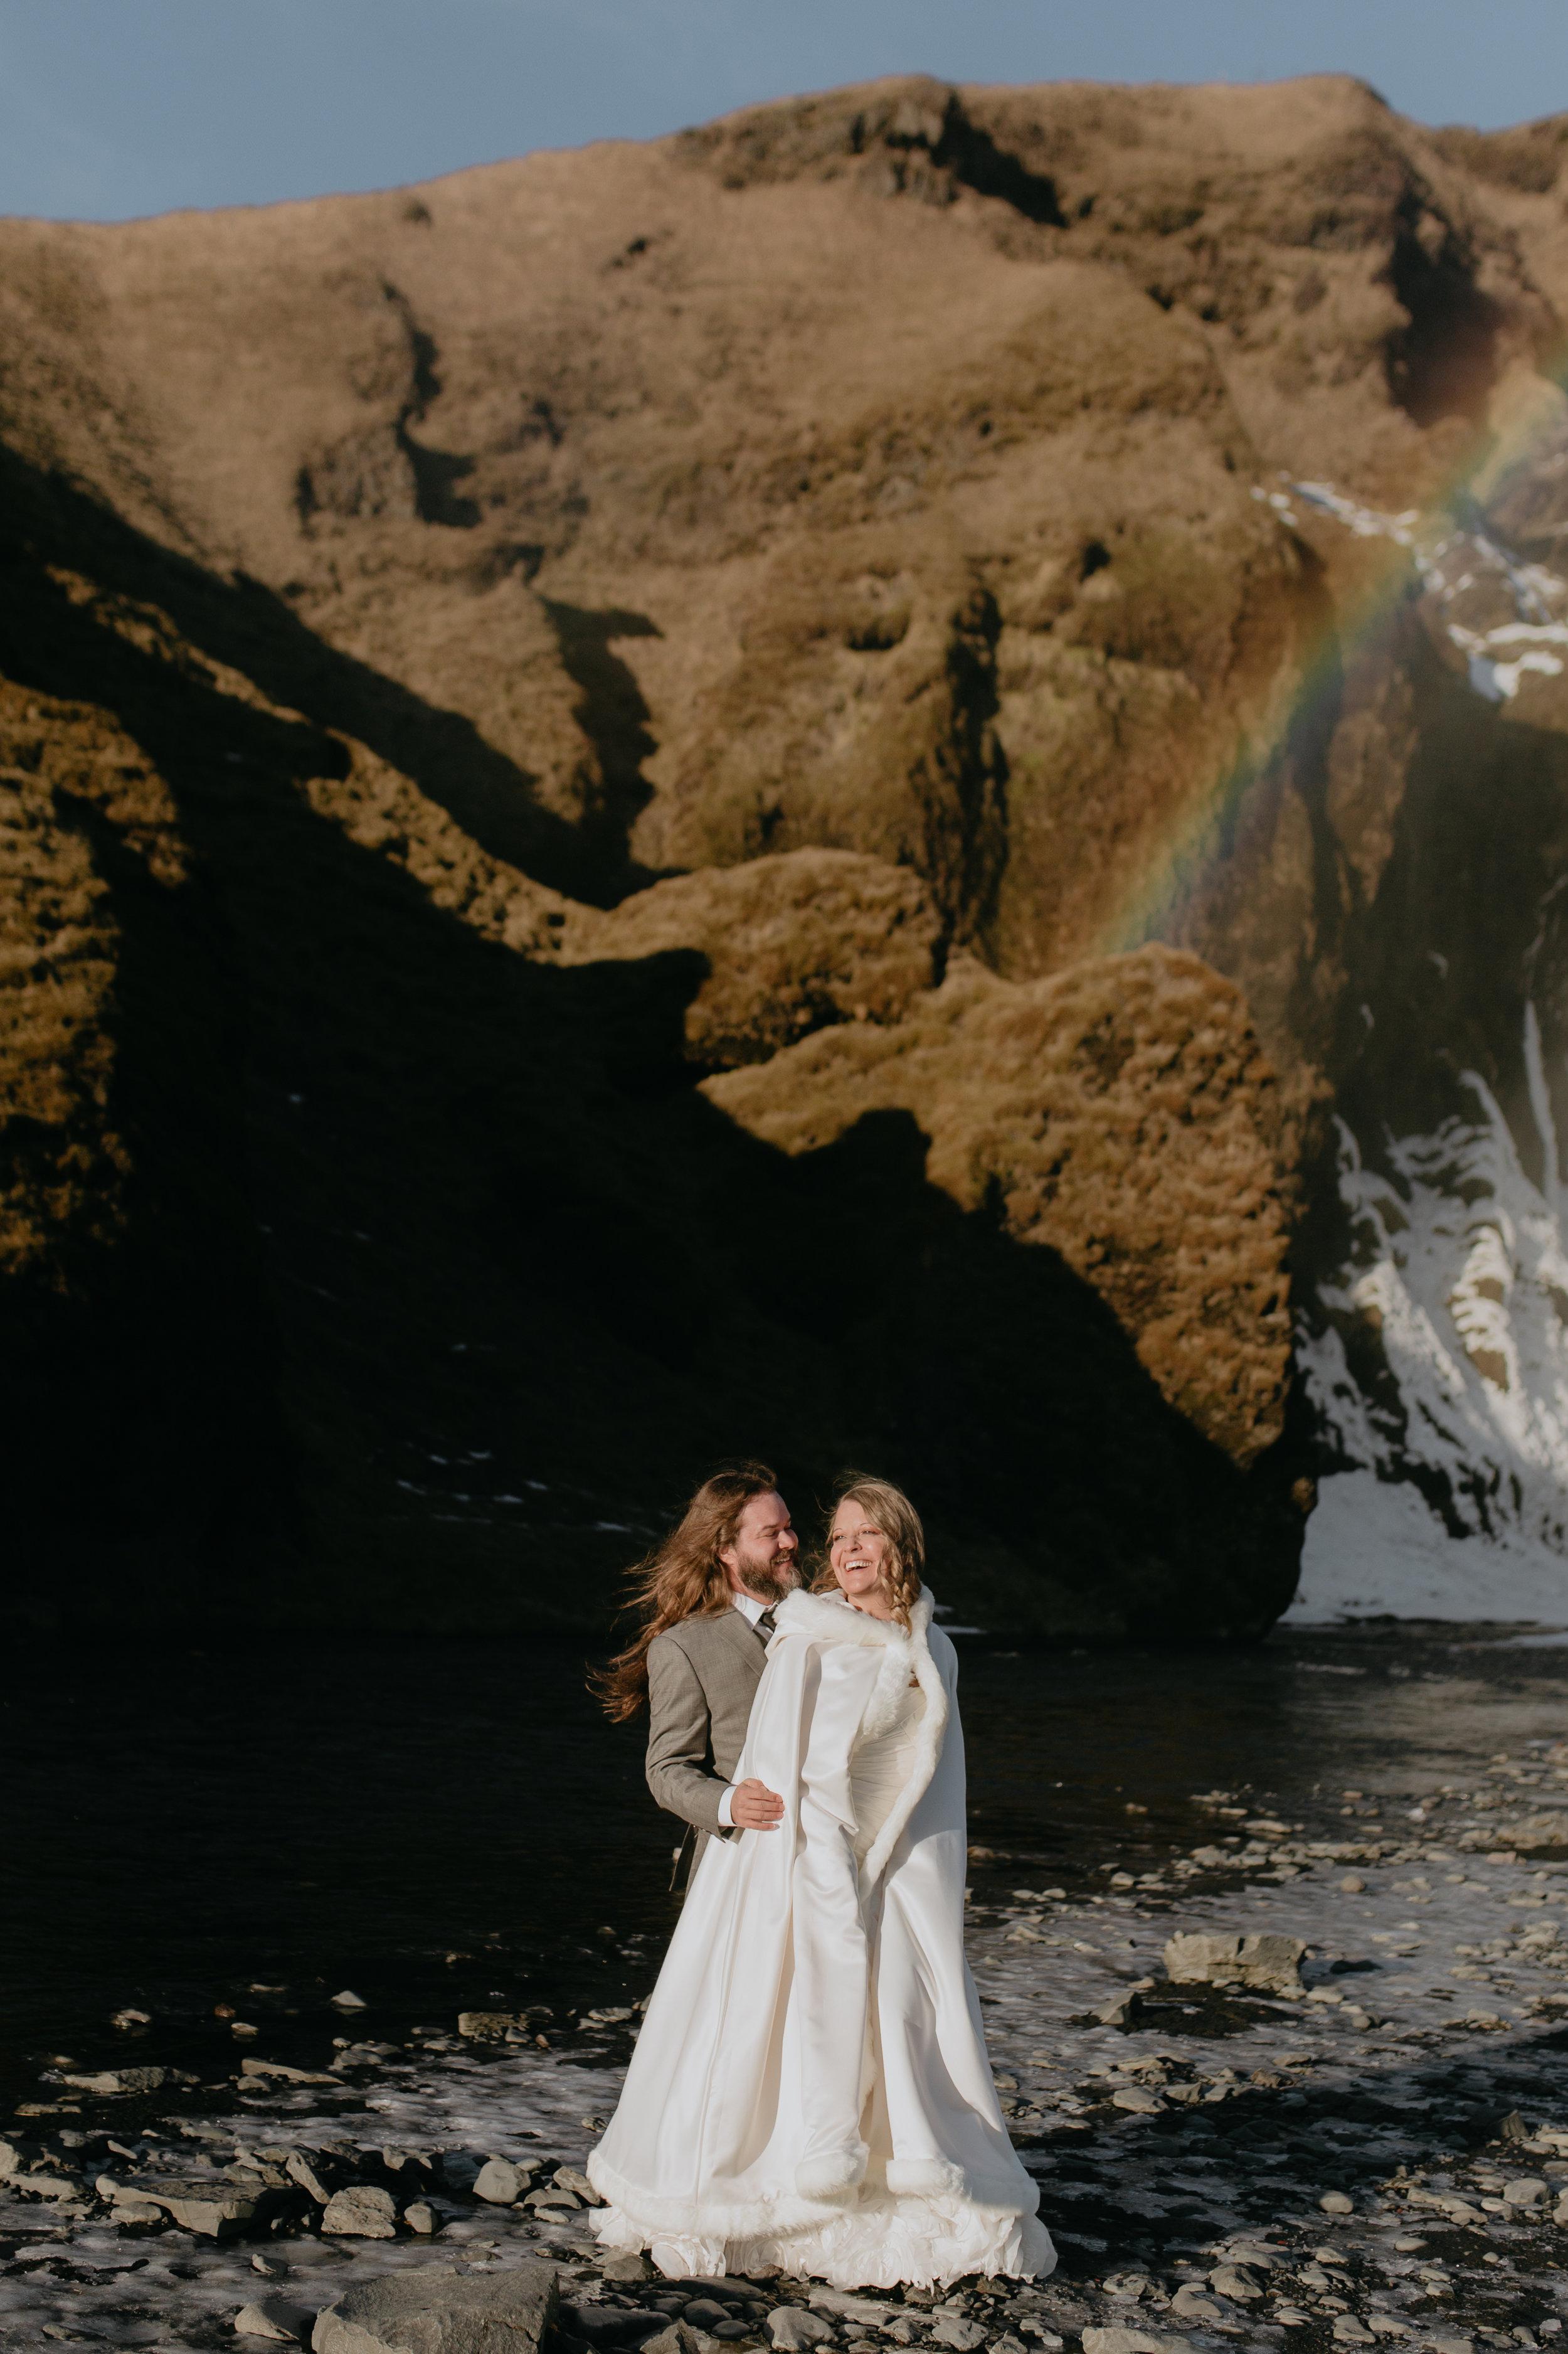 nicole-daacke-photography-iceland-winter-sunset-adventure-elopement-skogafoss-waterfall-black-sand-beach-dyrholaey-vik-iceland-intimate-wedding-black-church-elopement-photographer-4.jpg